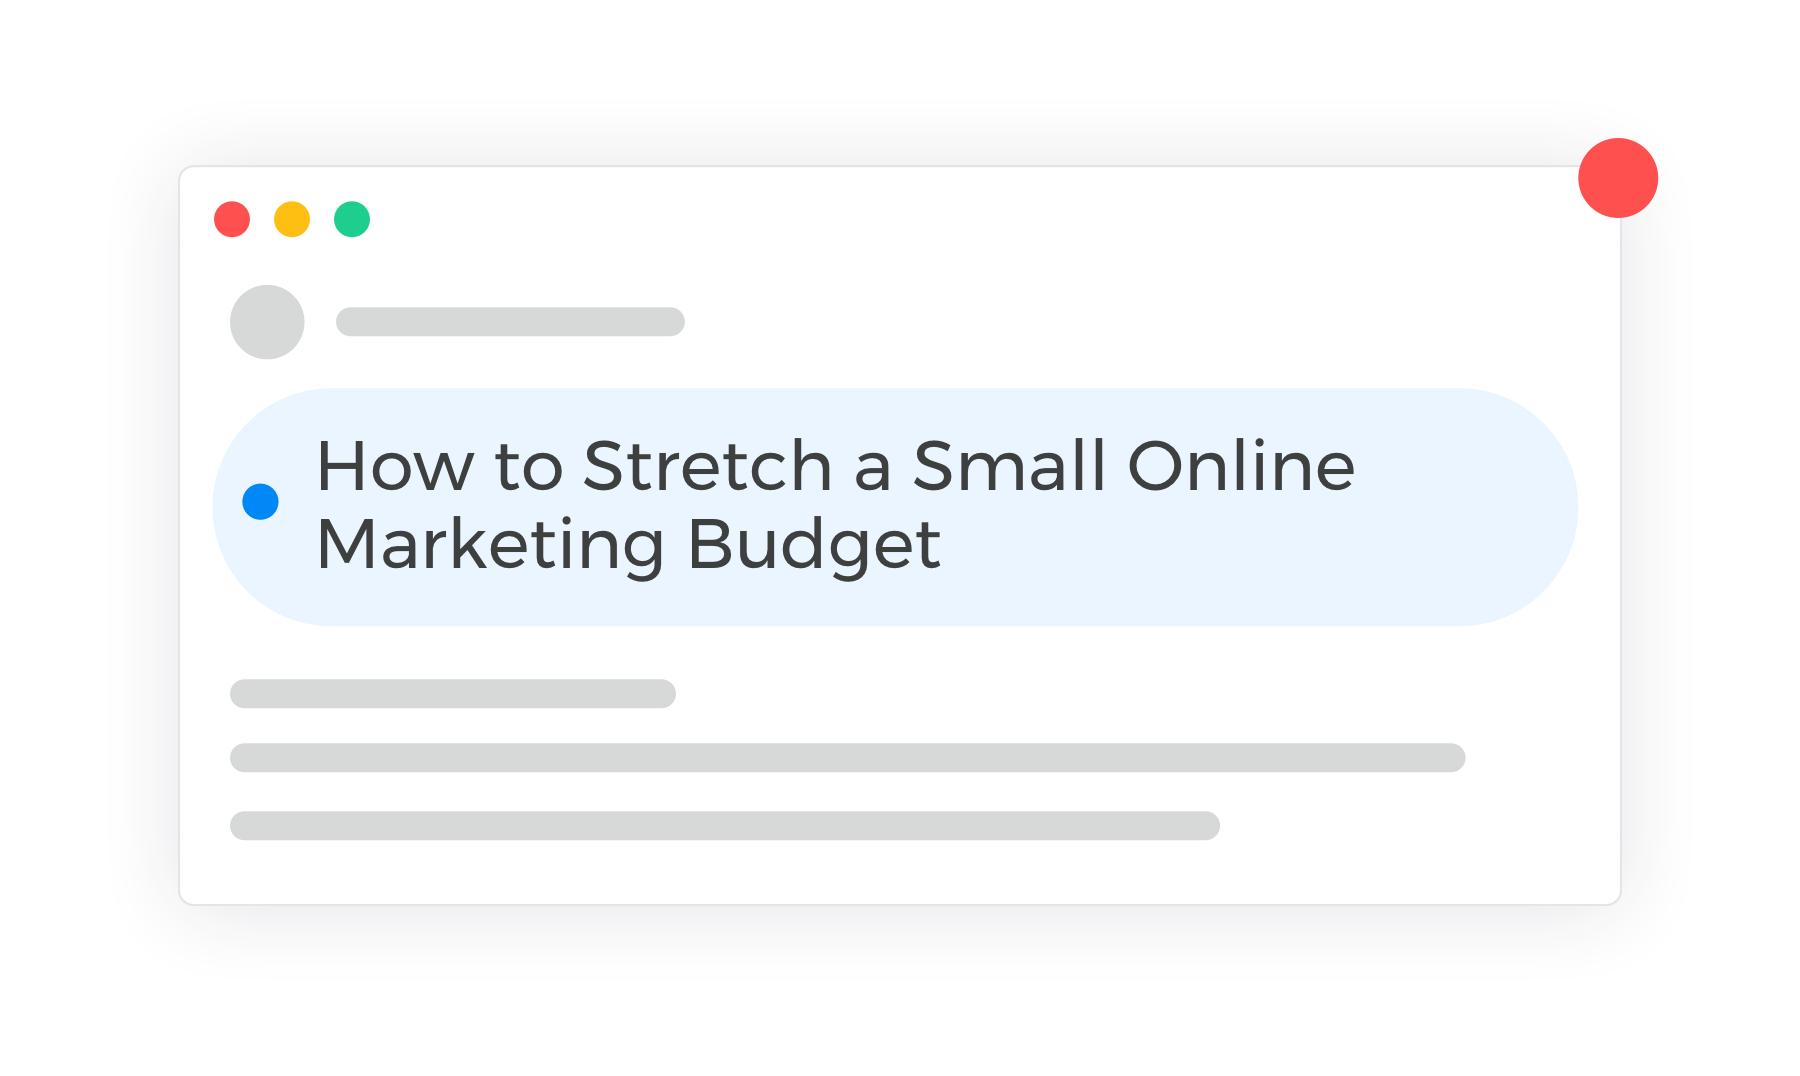 Stretch_a_marketing_budget_email_subject_line